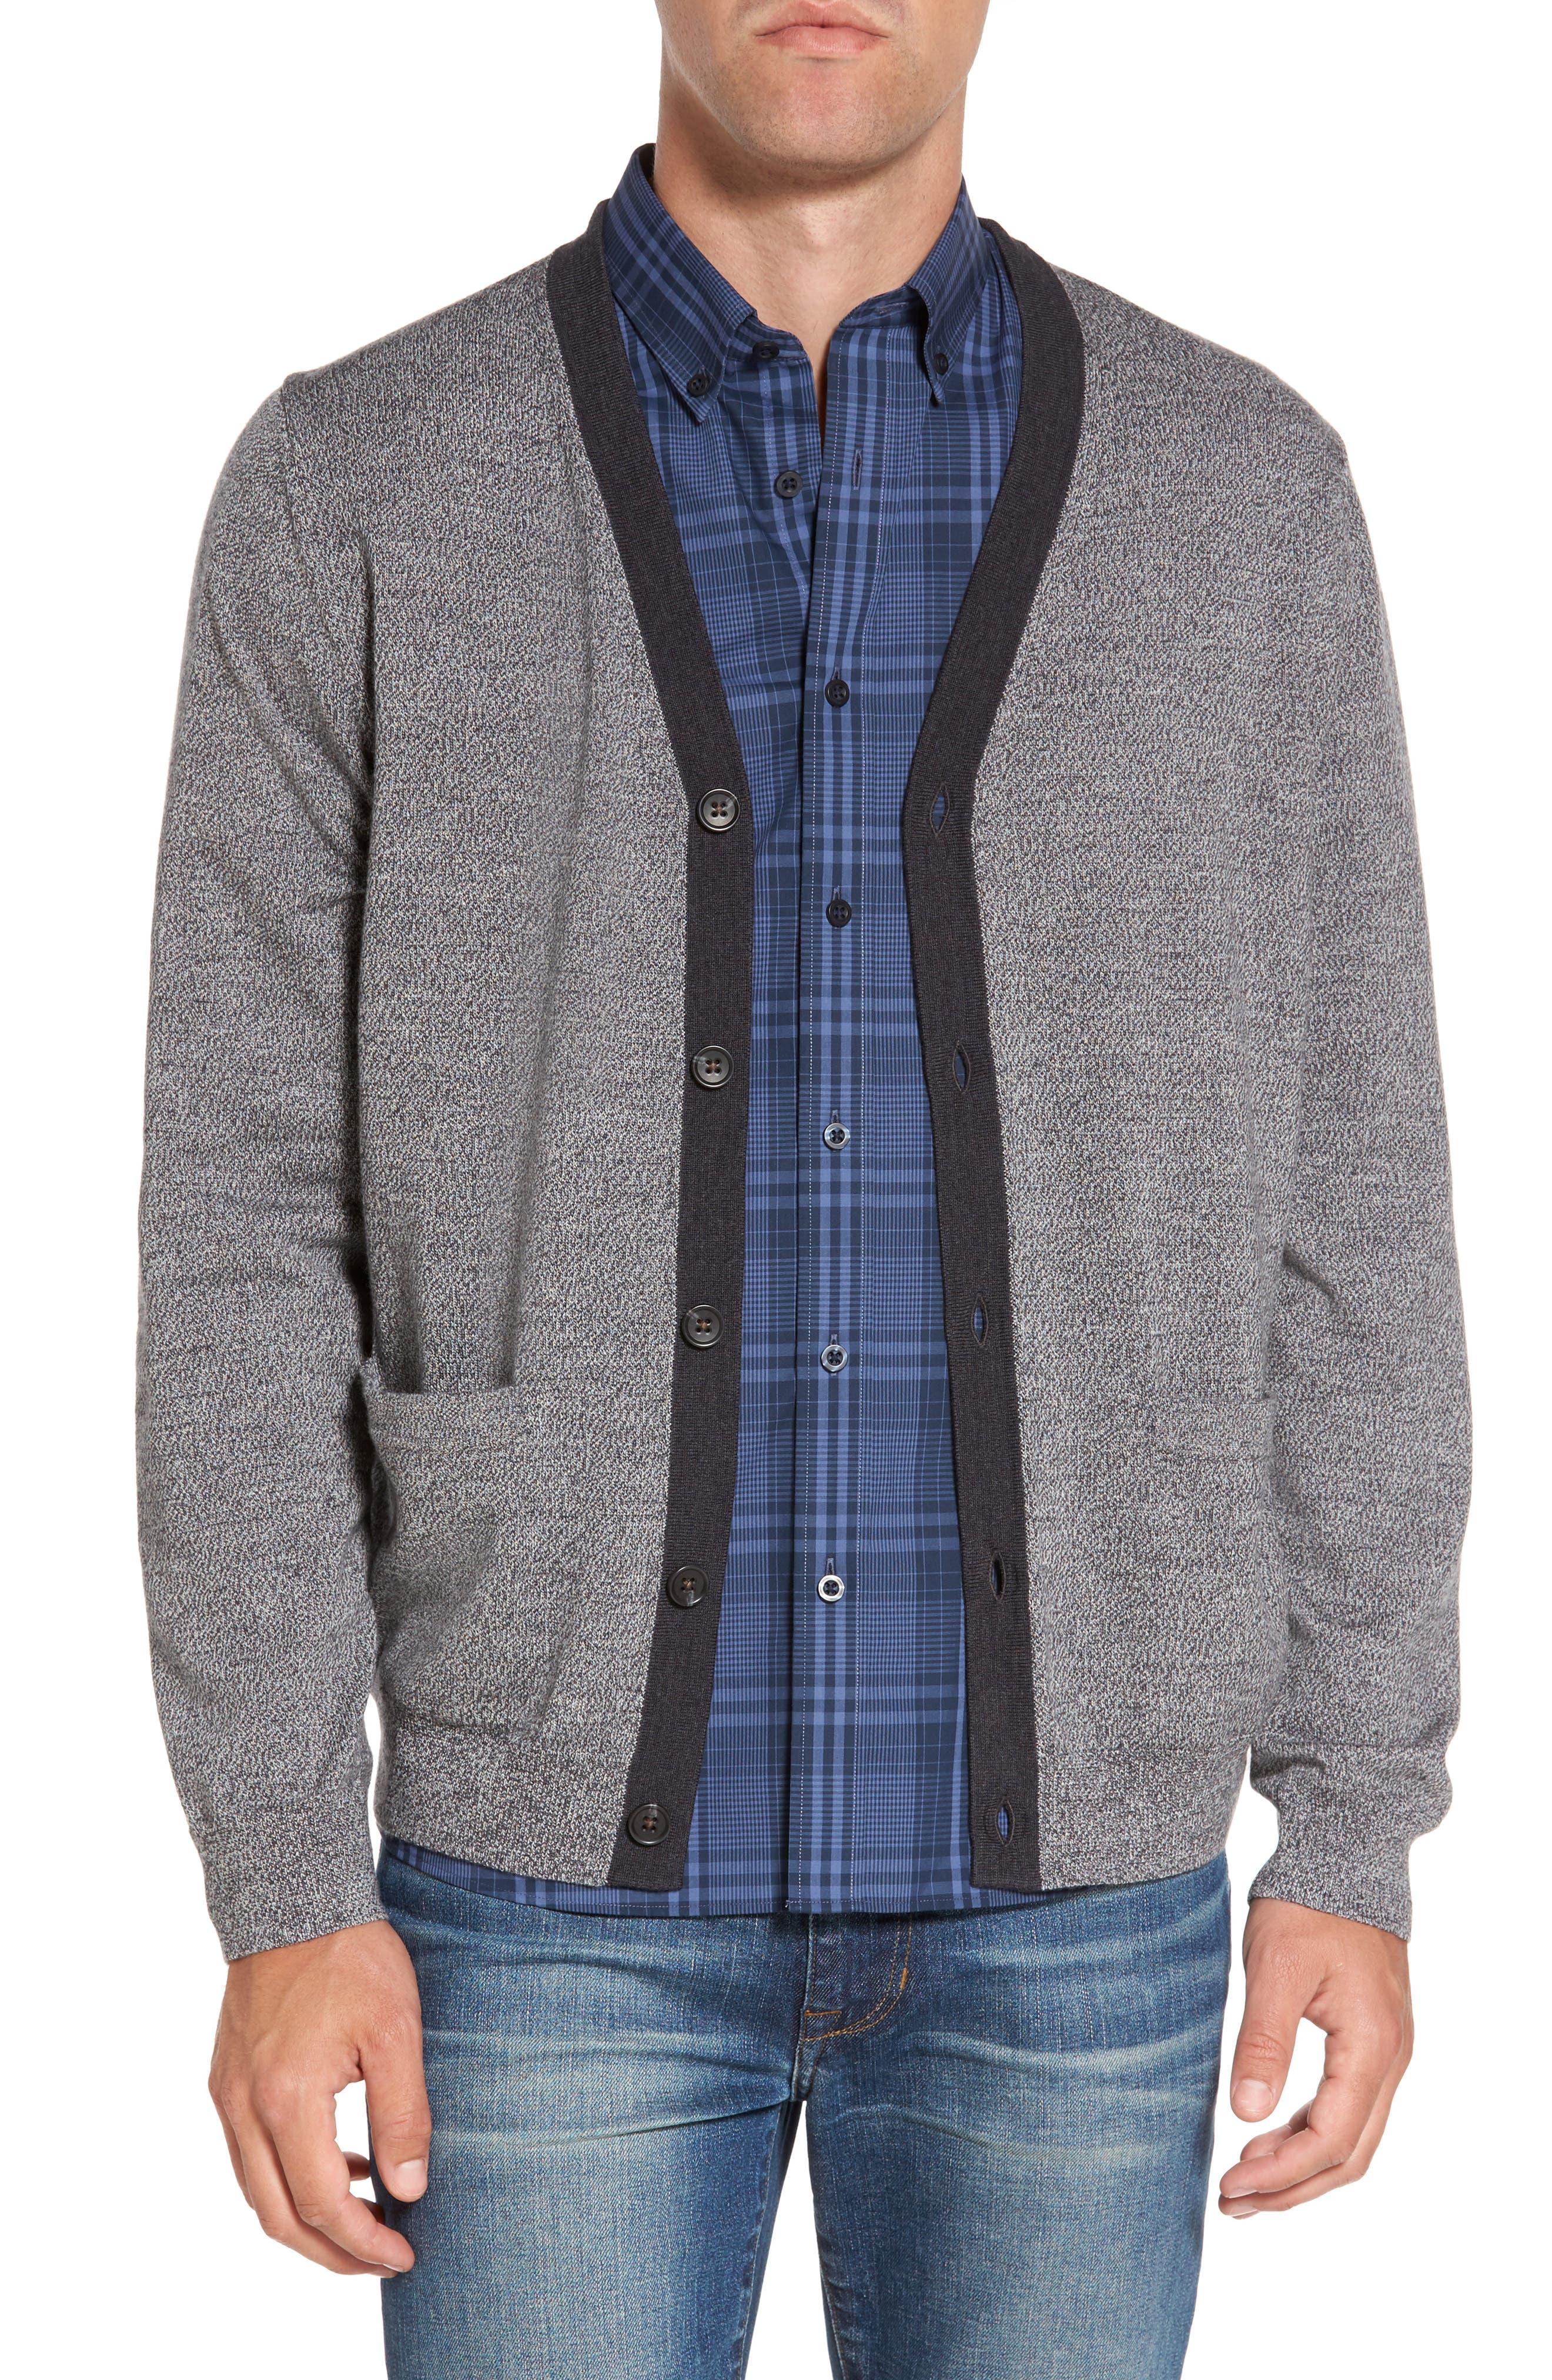 Main Image - Nordstrom Men's Shop Contrast Trim Merino Wool Cardigan